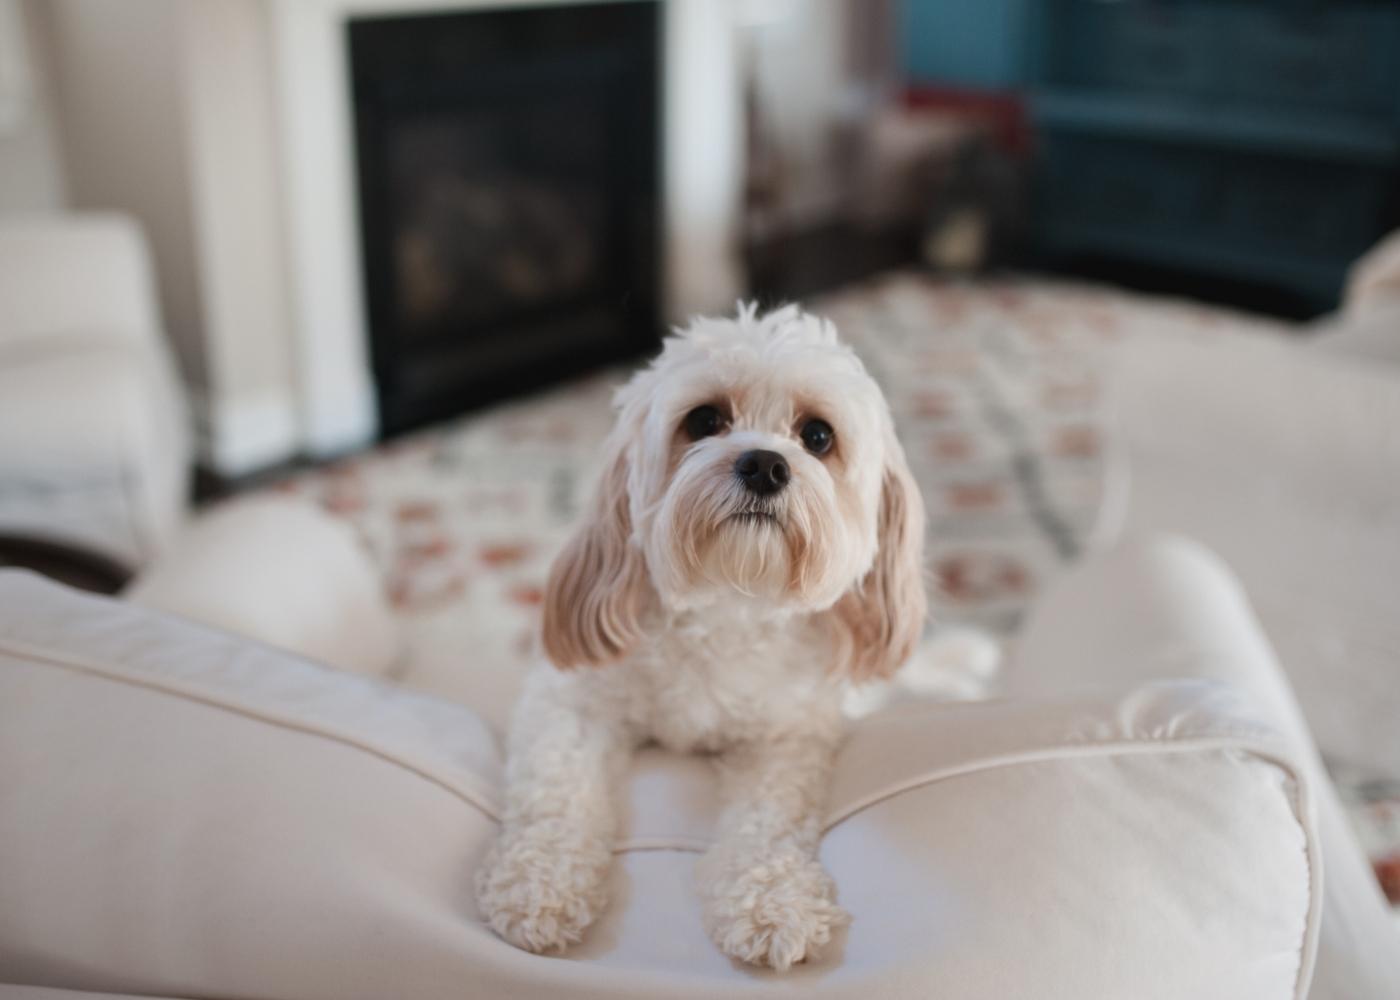 Caniche a brincar no sofá